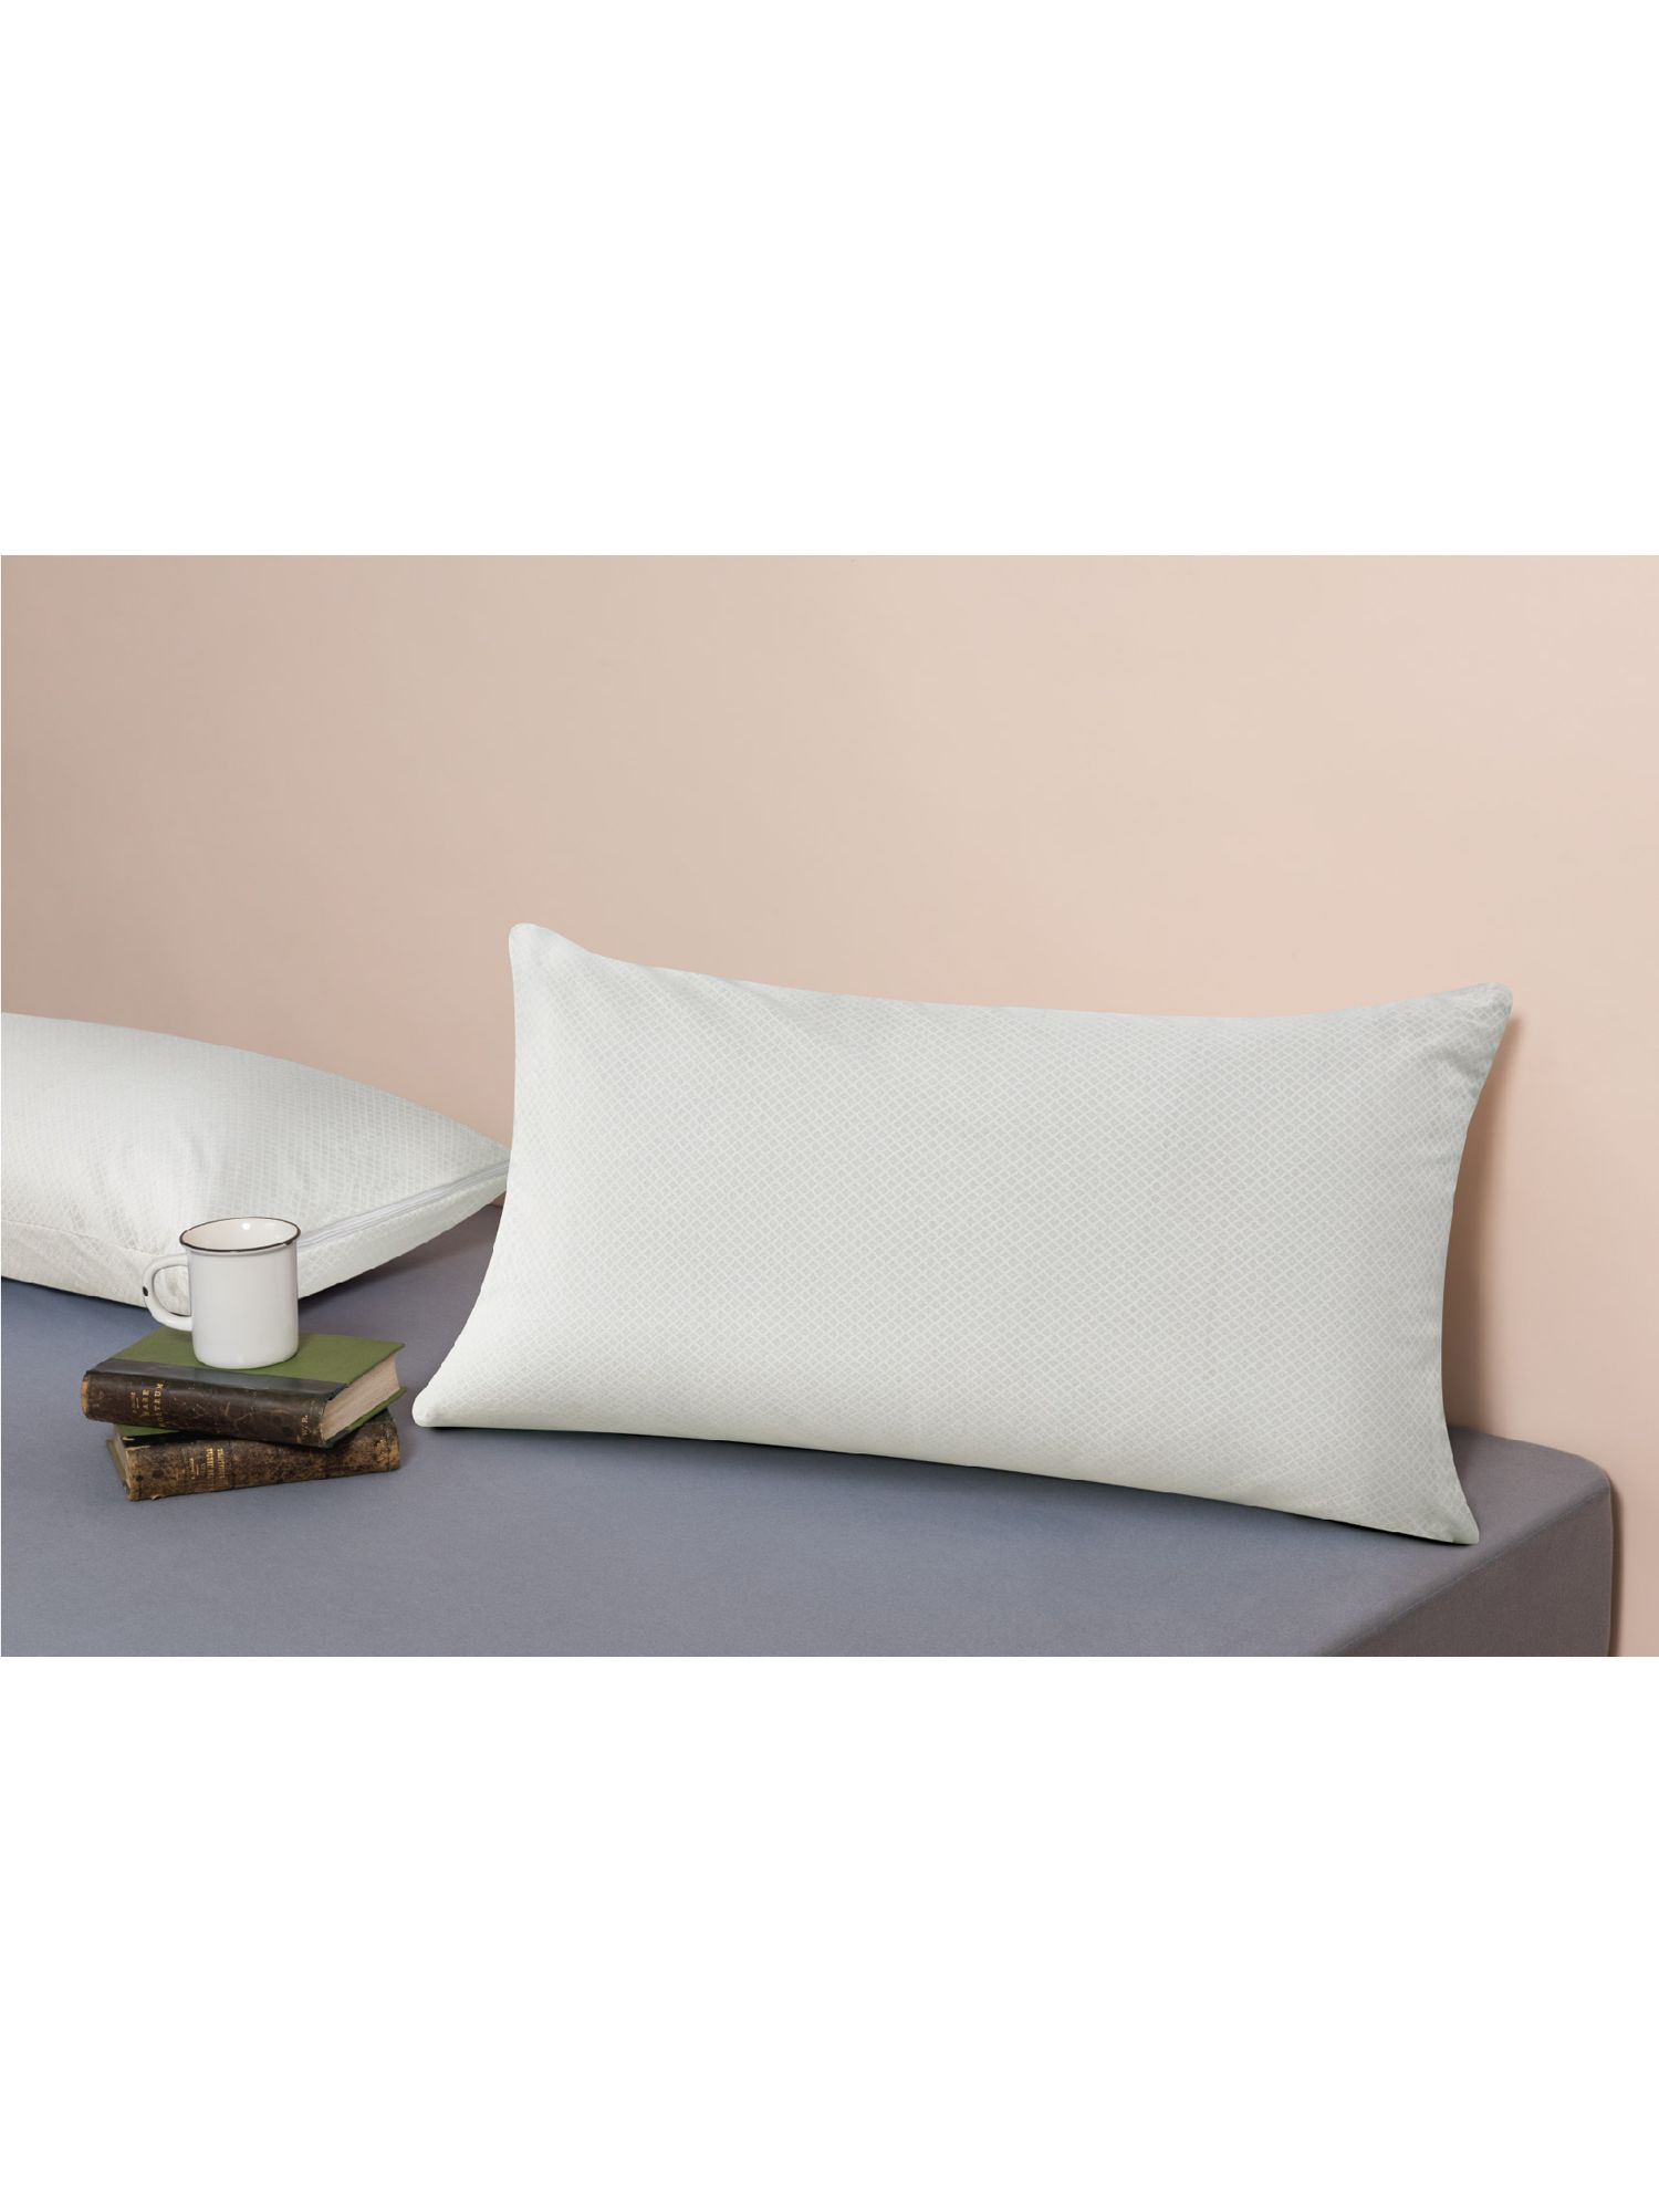 Velfont Thermo-Regulator Synthetic Standard Pillow, Medium/Firm